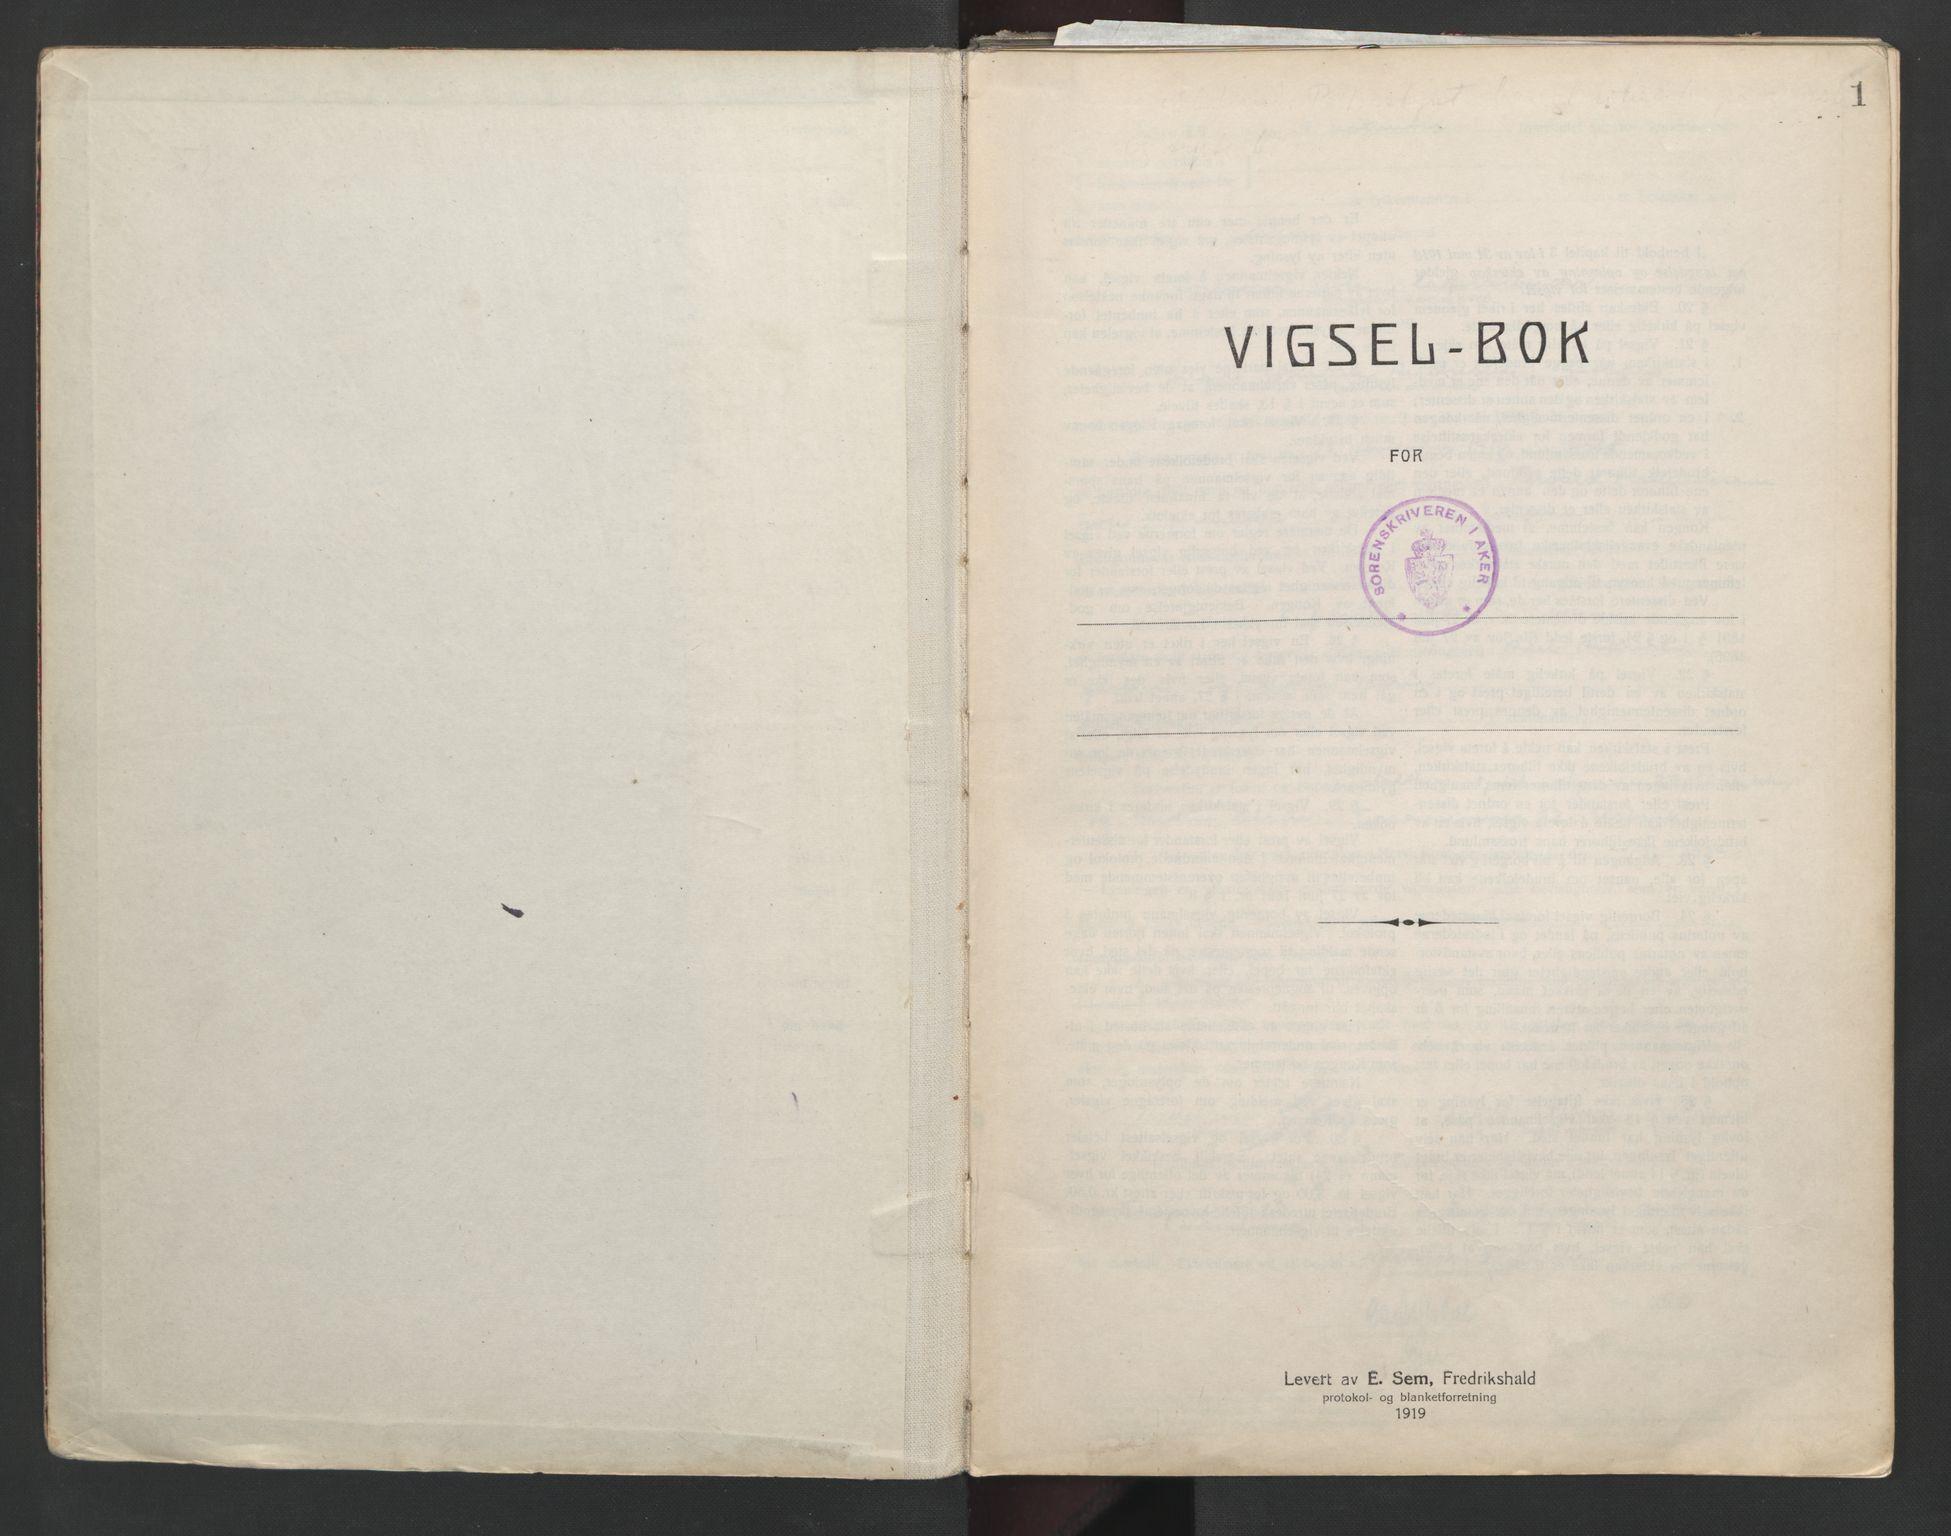 SAO, Aker sorenskriveri, L/Lc/Lcb/L0012: Vigselprotokoll, 1939-1940, s. 1